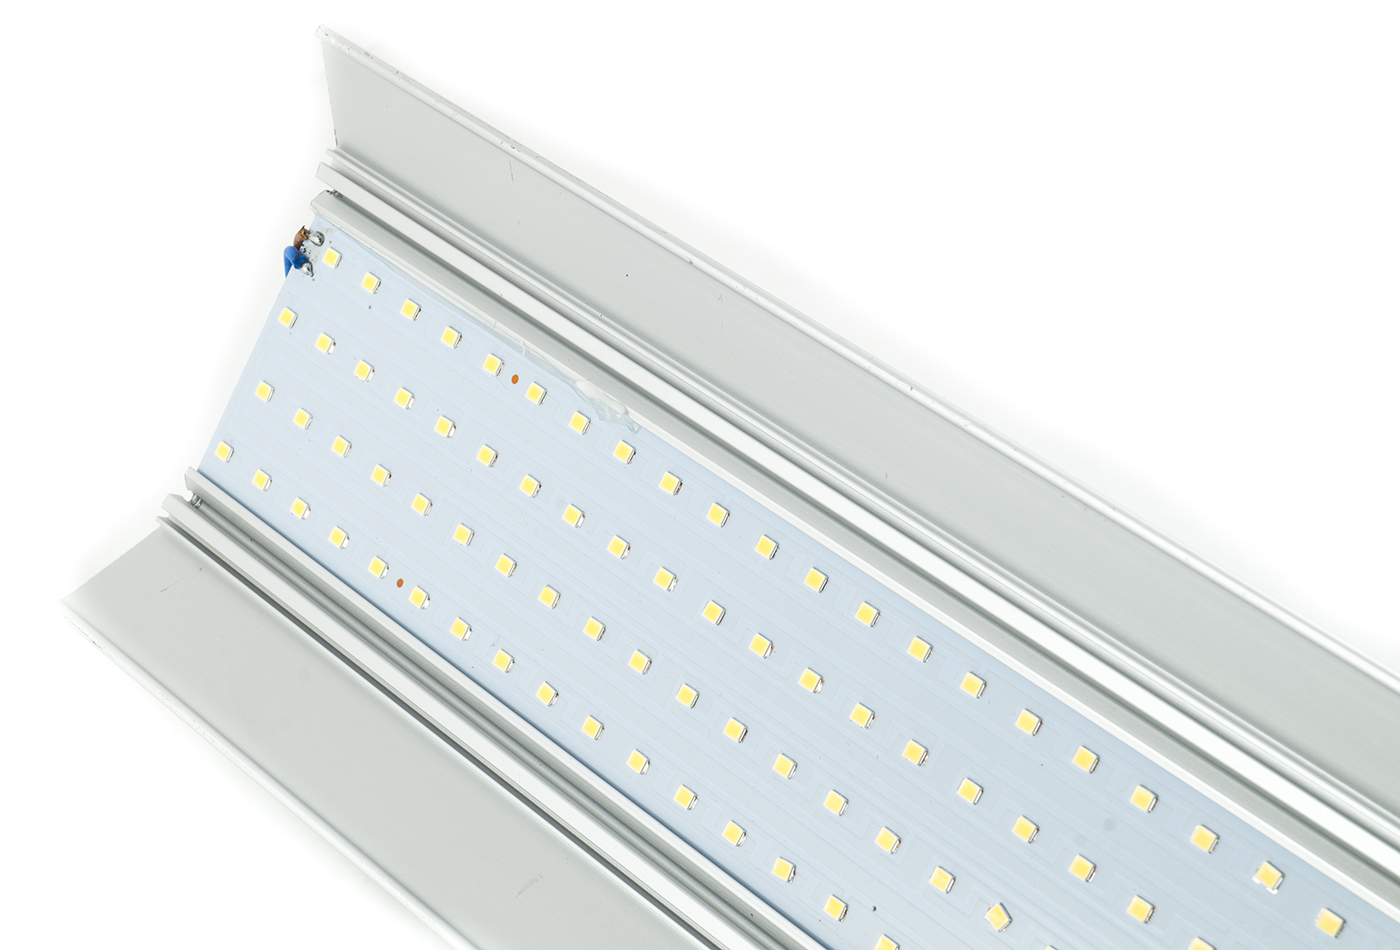 Plafoniera Led Soffitto 150 Cm : Bes plafoniere beselettronica plafoniera lampada luce